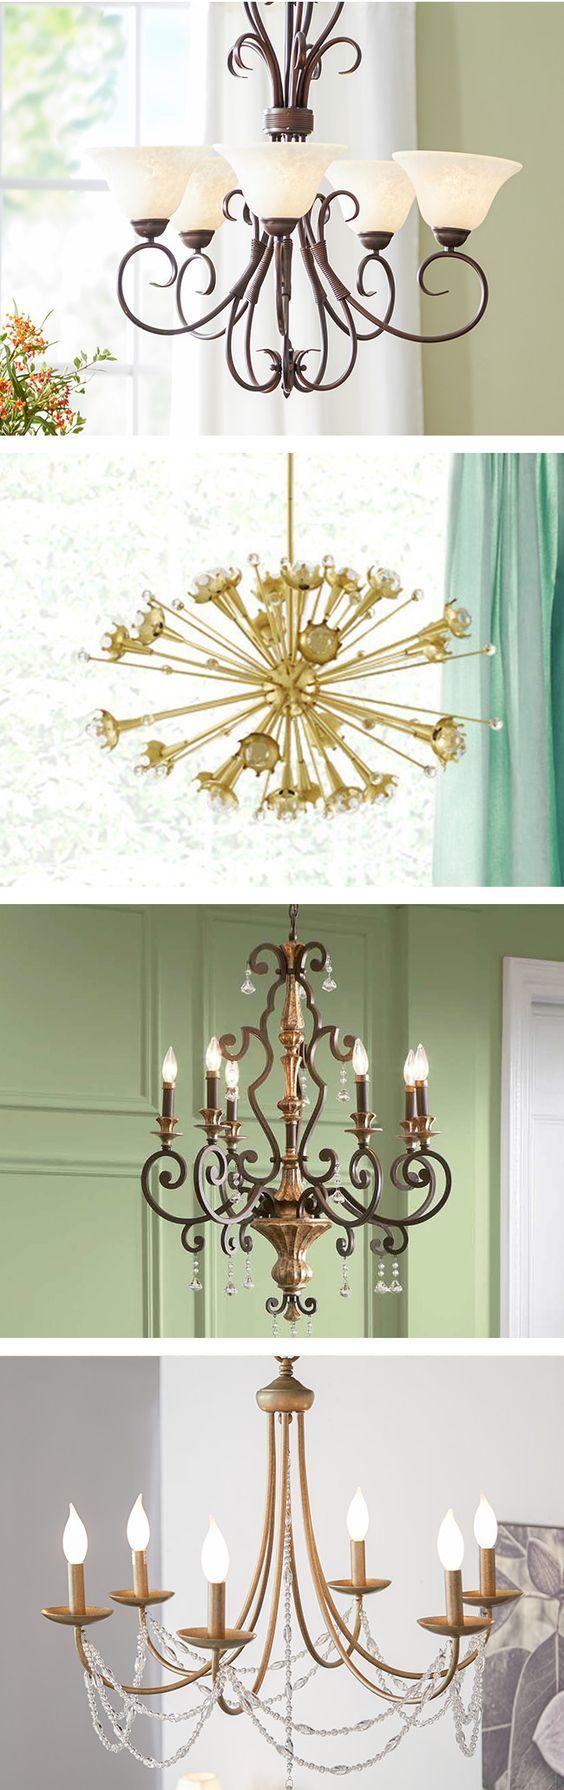 statement lighting. Statement Lighting - Gorgeous Chandeliers #lighting #inspiration